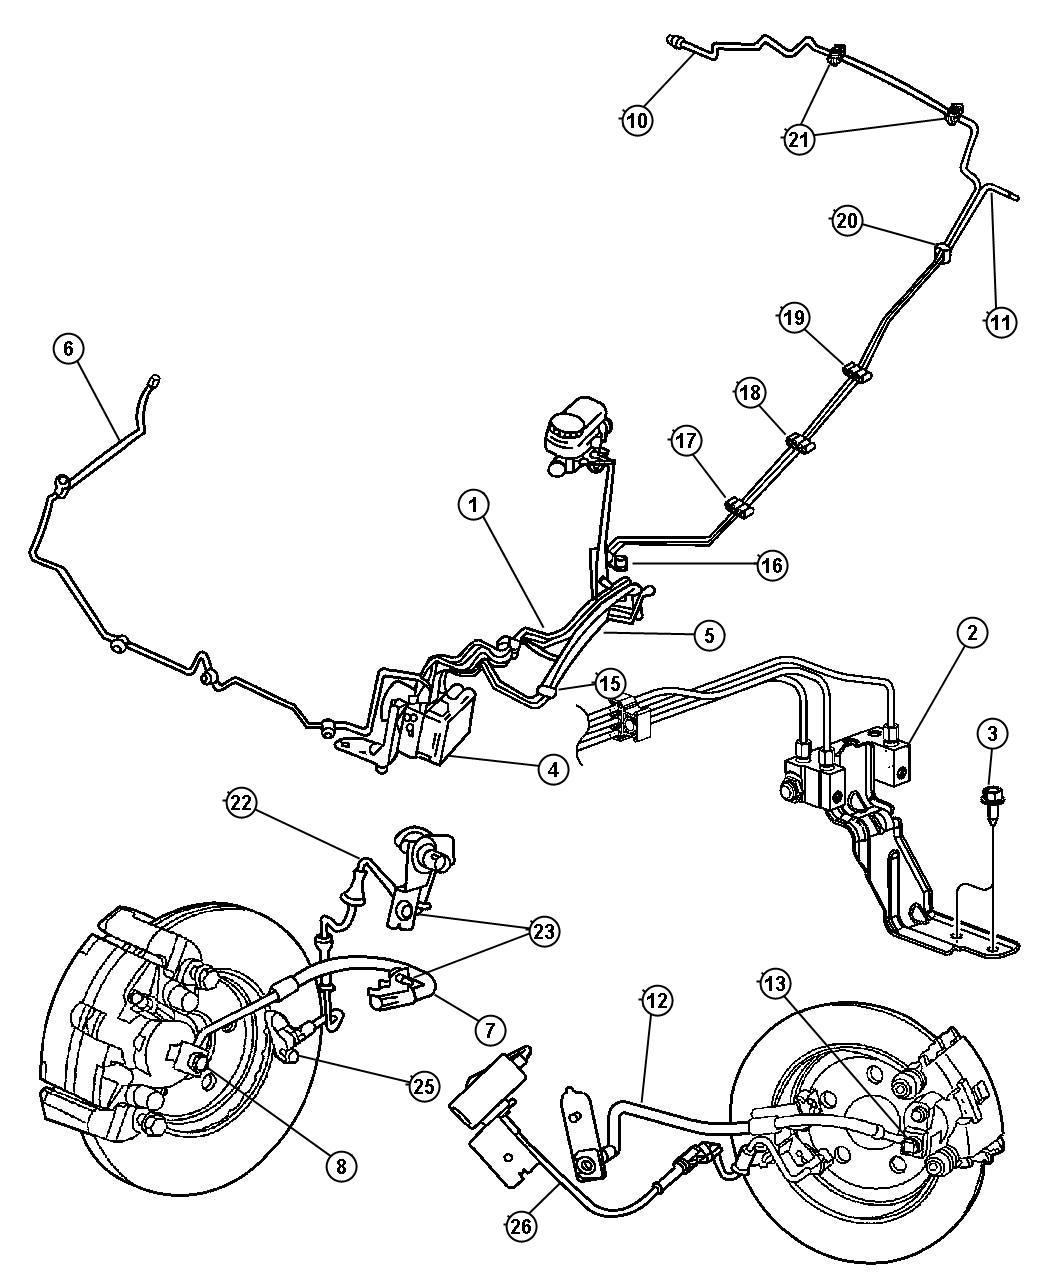 2004 Chrysler Sebring Prop valve. Brake. [brb]. Brakes